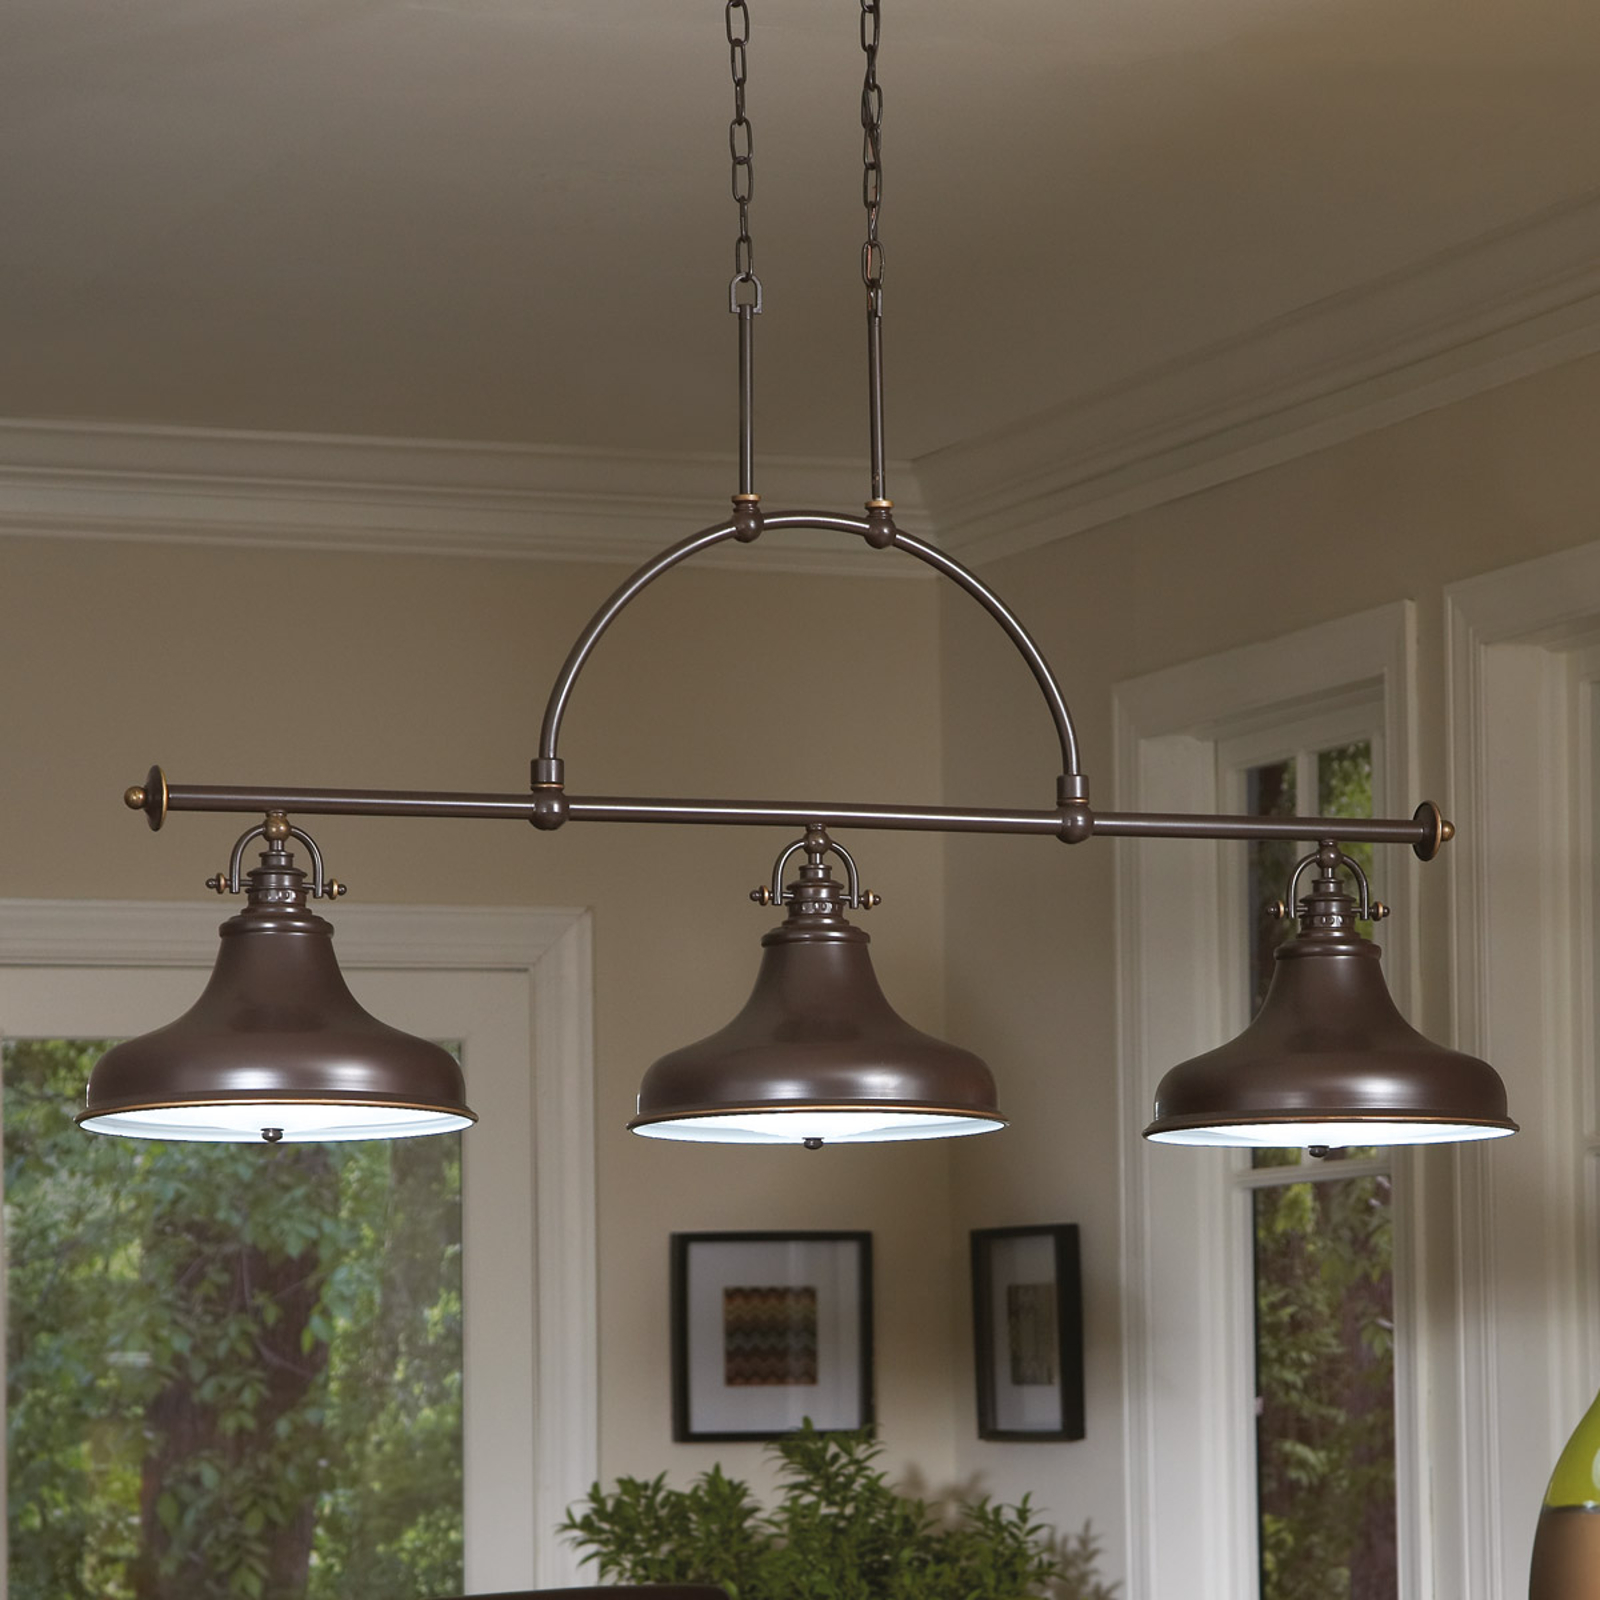 Emery industrial pendant lamp bronze 3-bulb_3048324_1